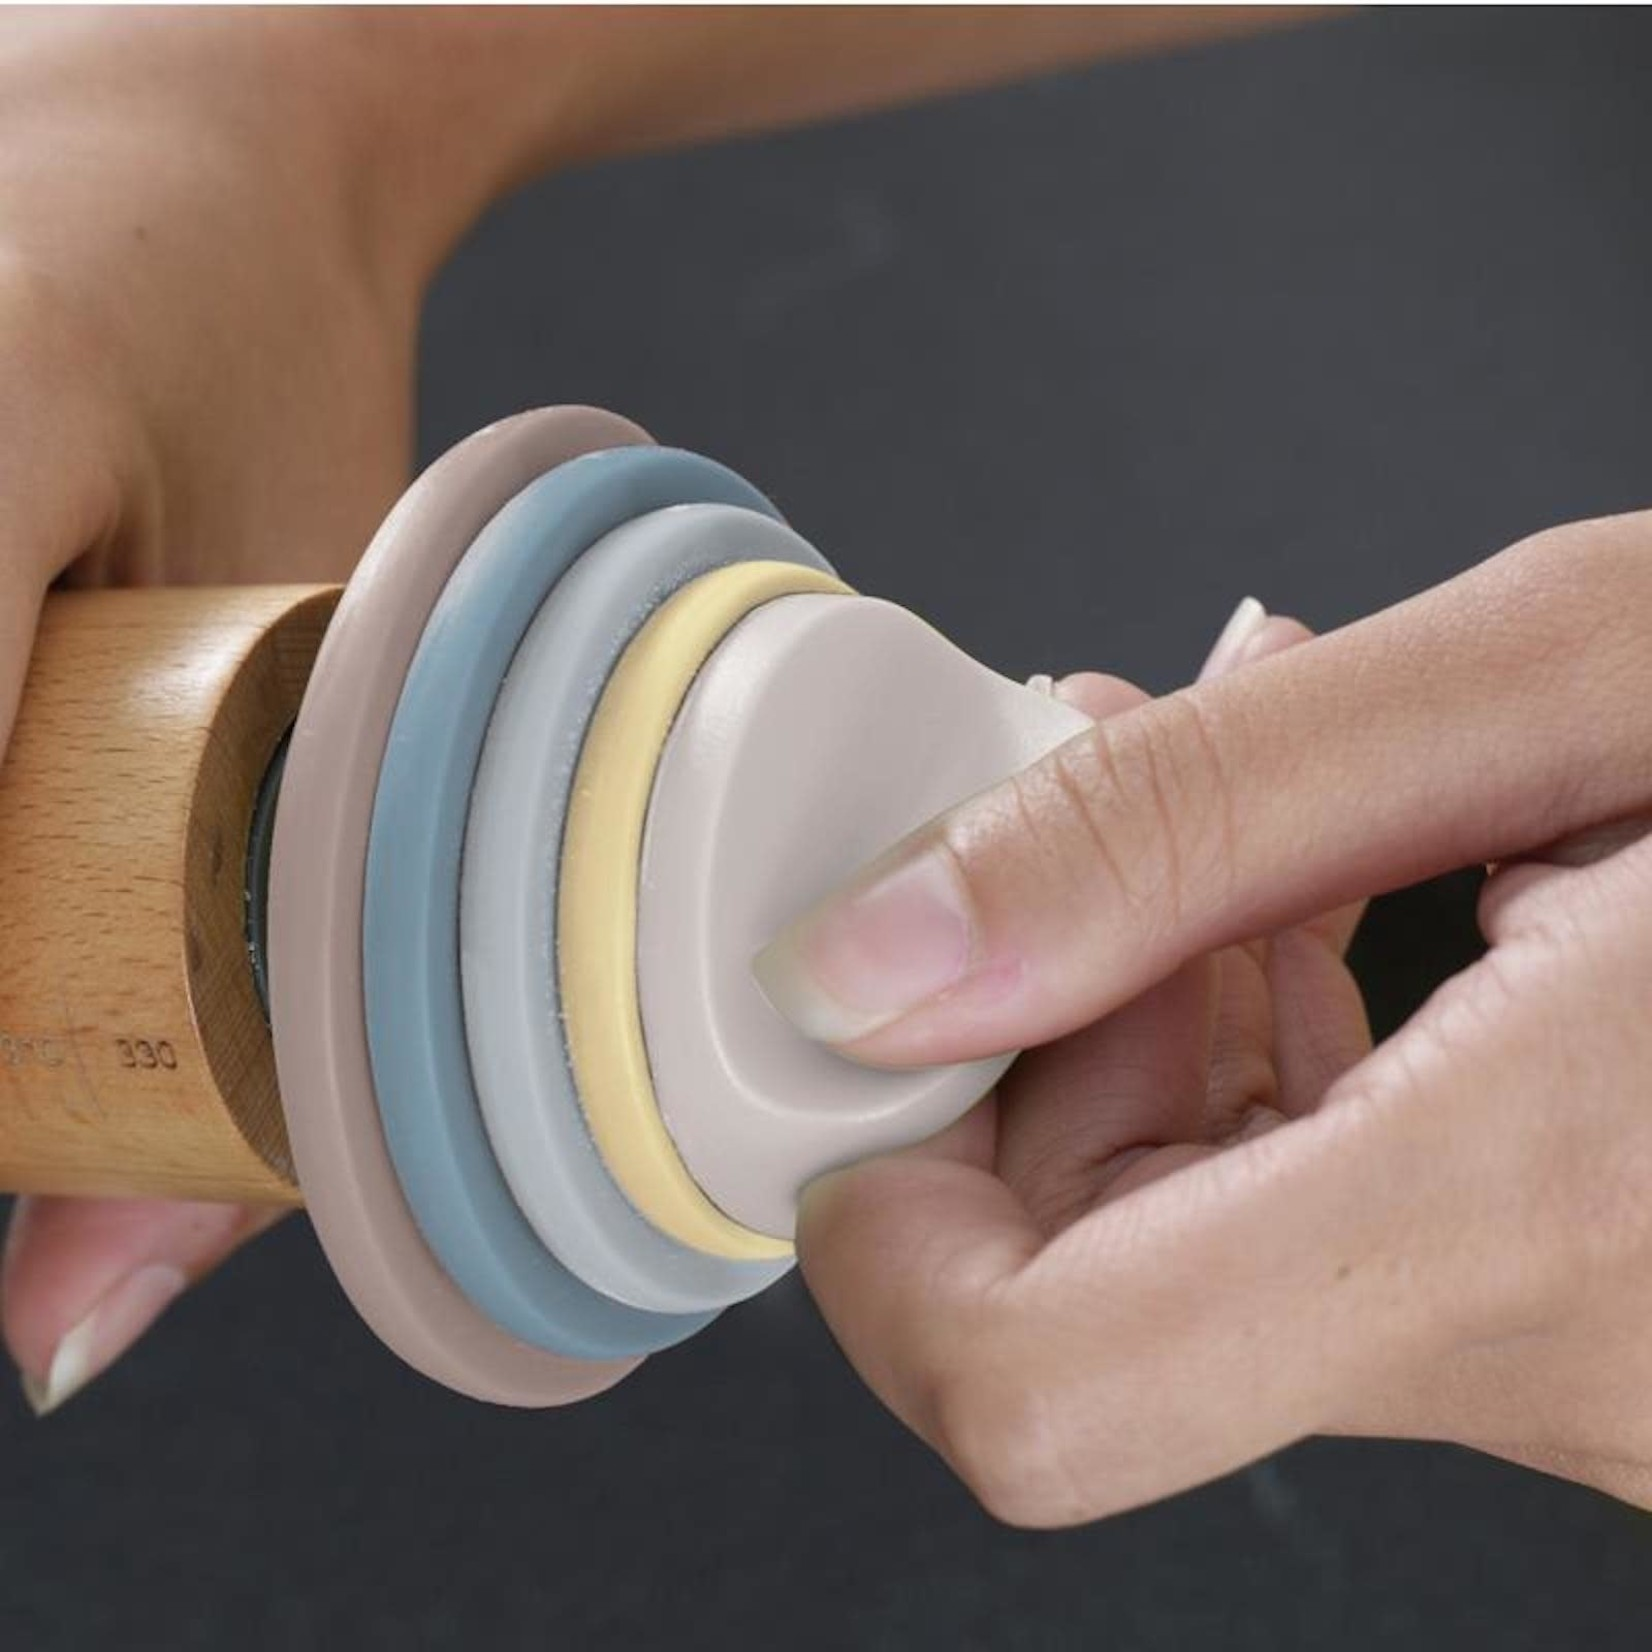 Joseph Joseph Adjustable Rolling Pin